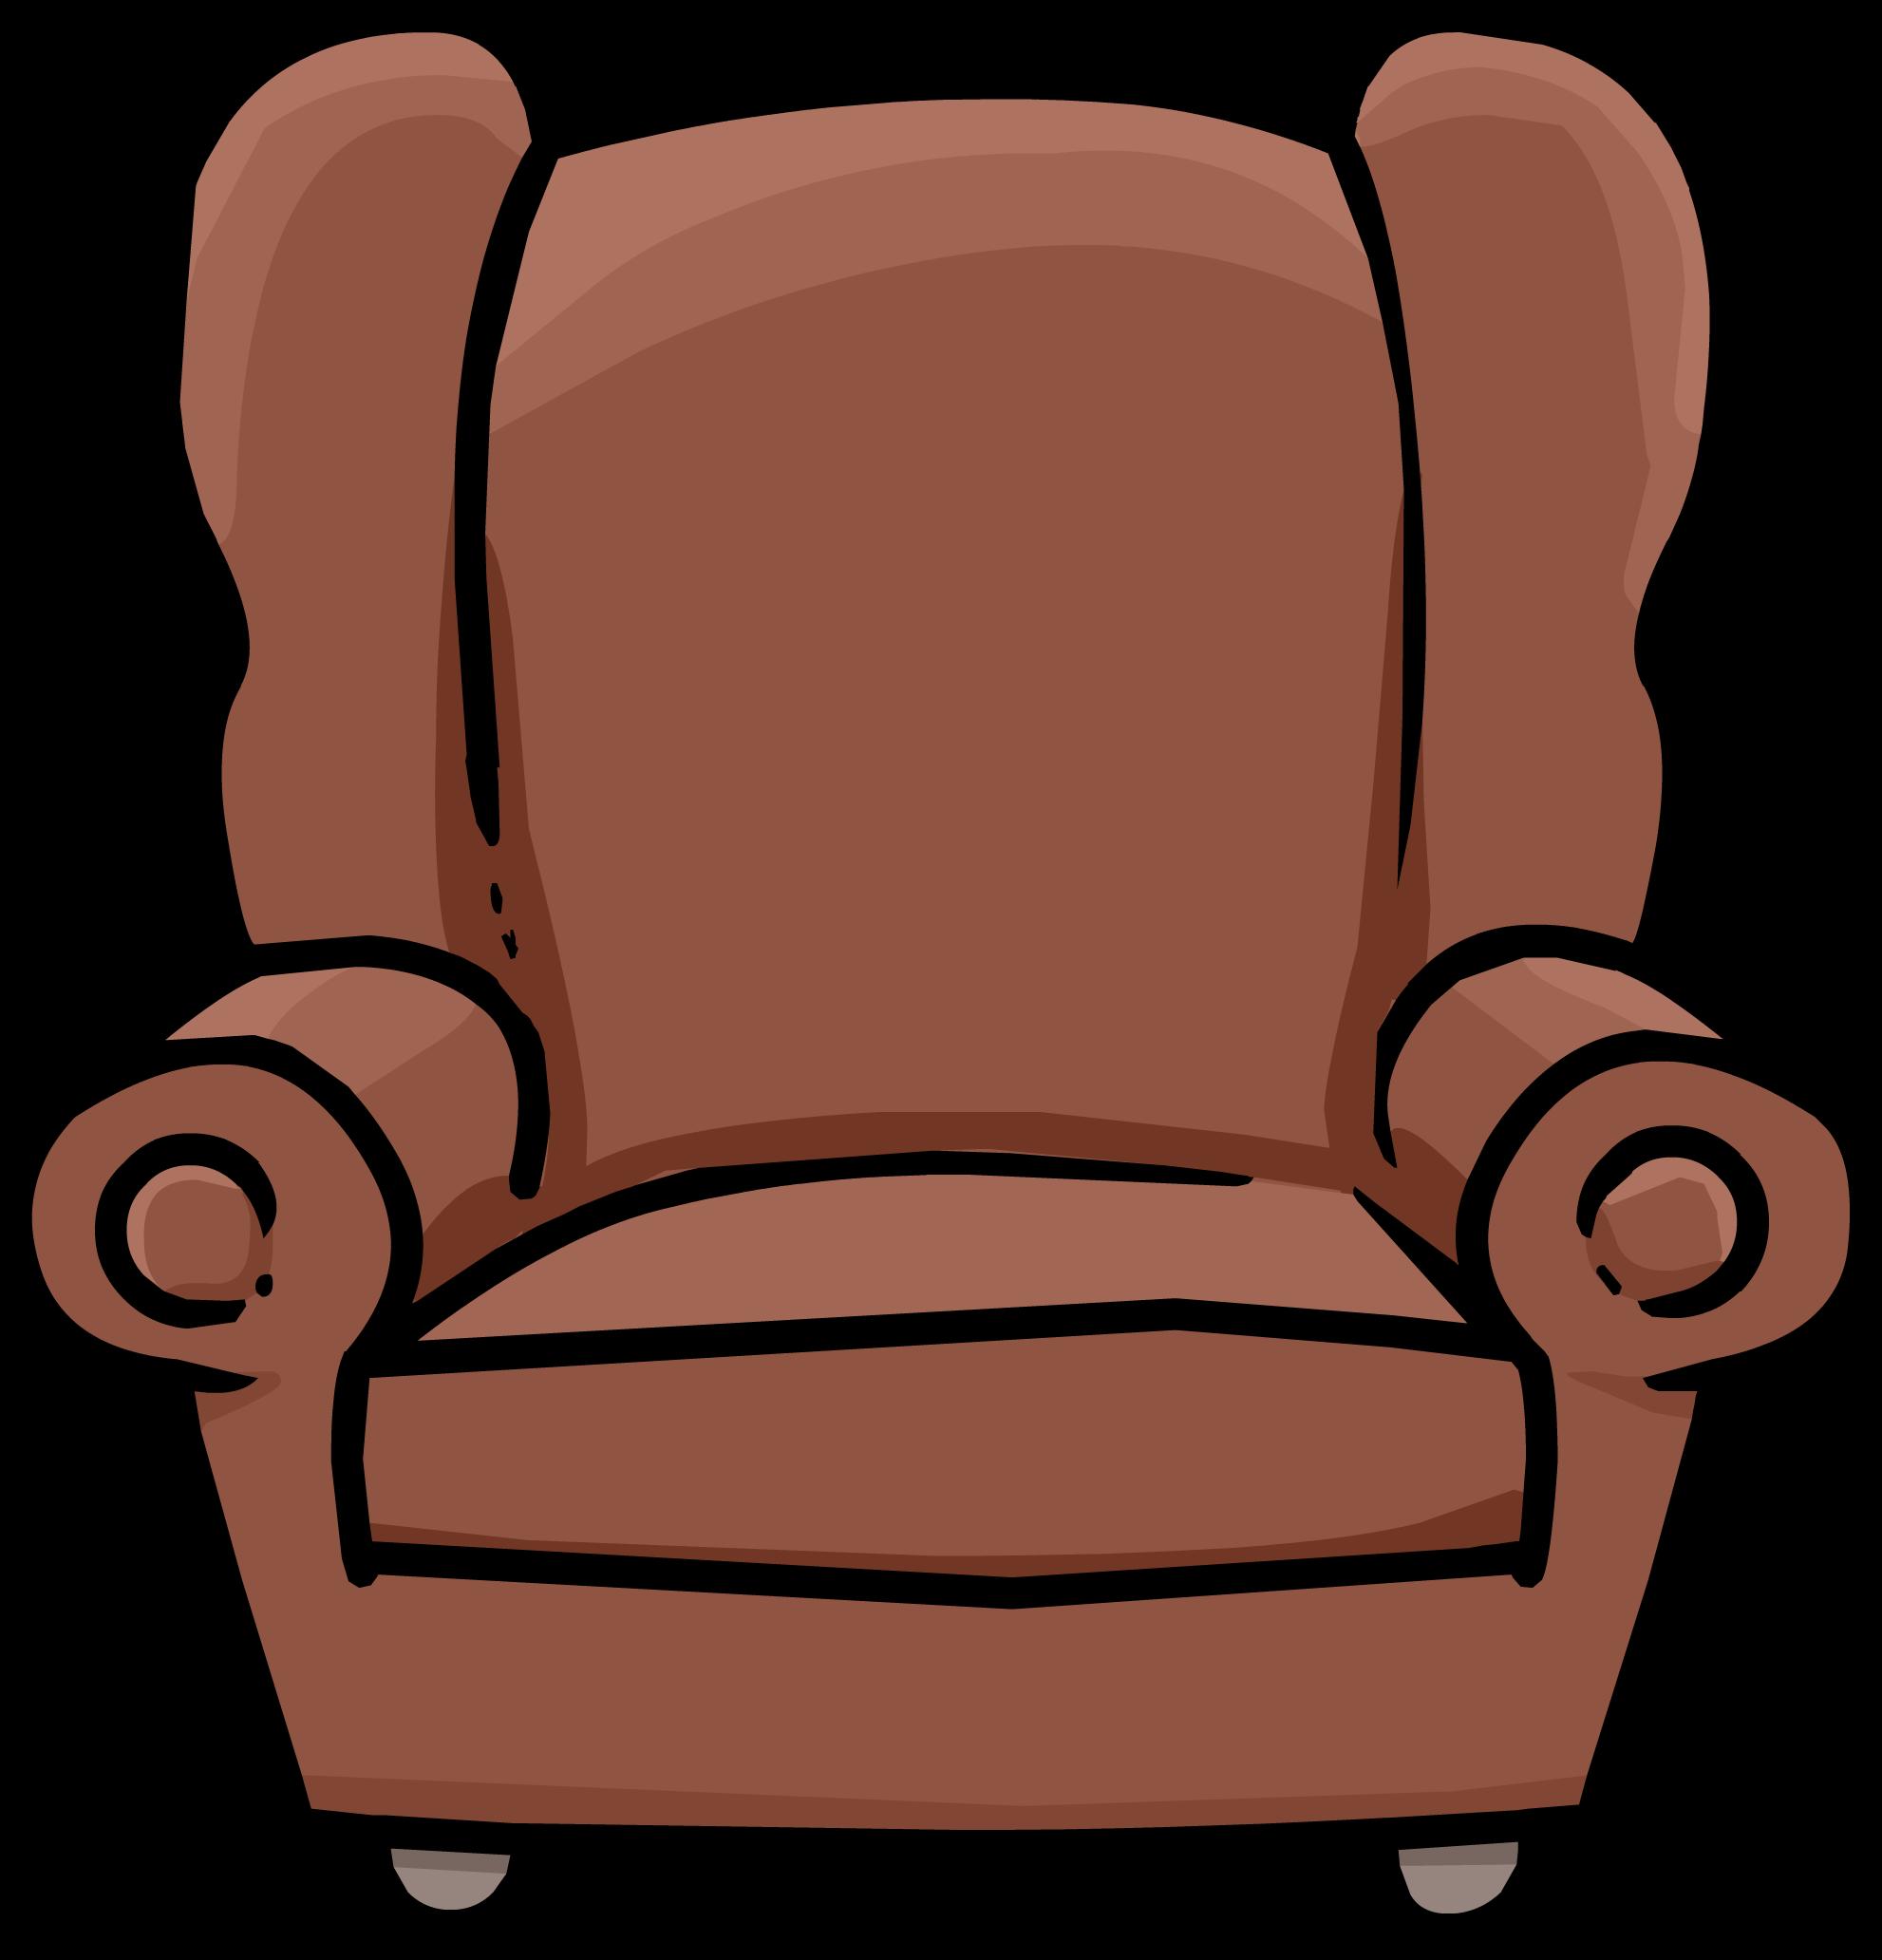 Book Room Arm Chair